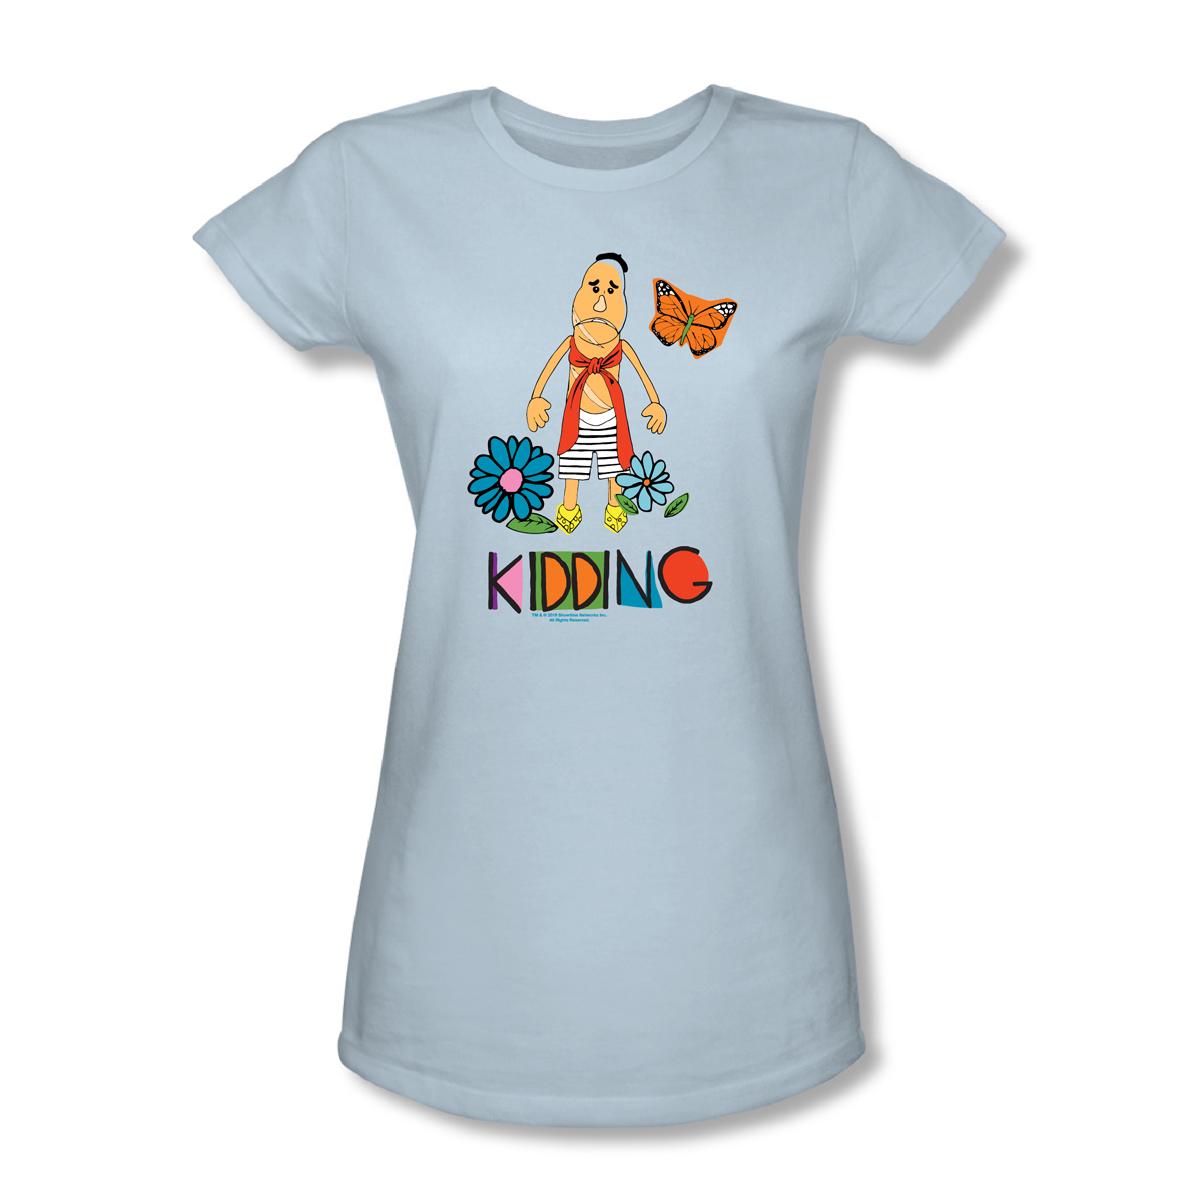 Kidding Ennui Le Triste Women's Slim Fit T-Shirt